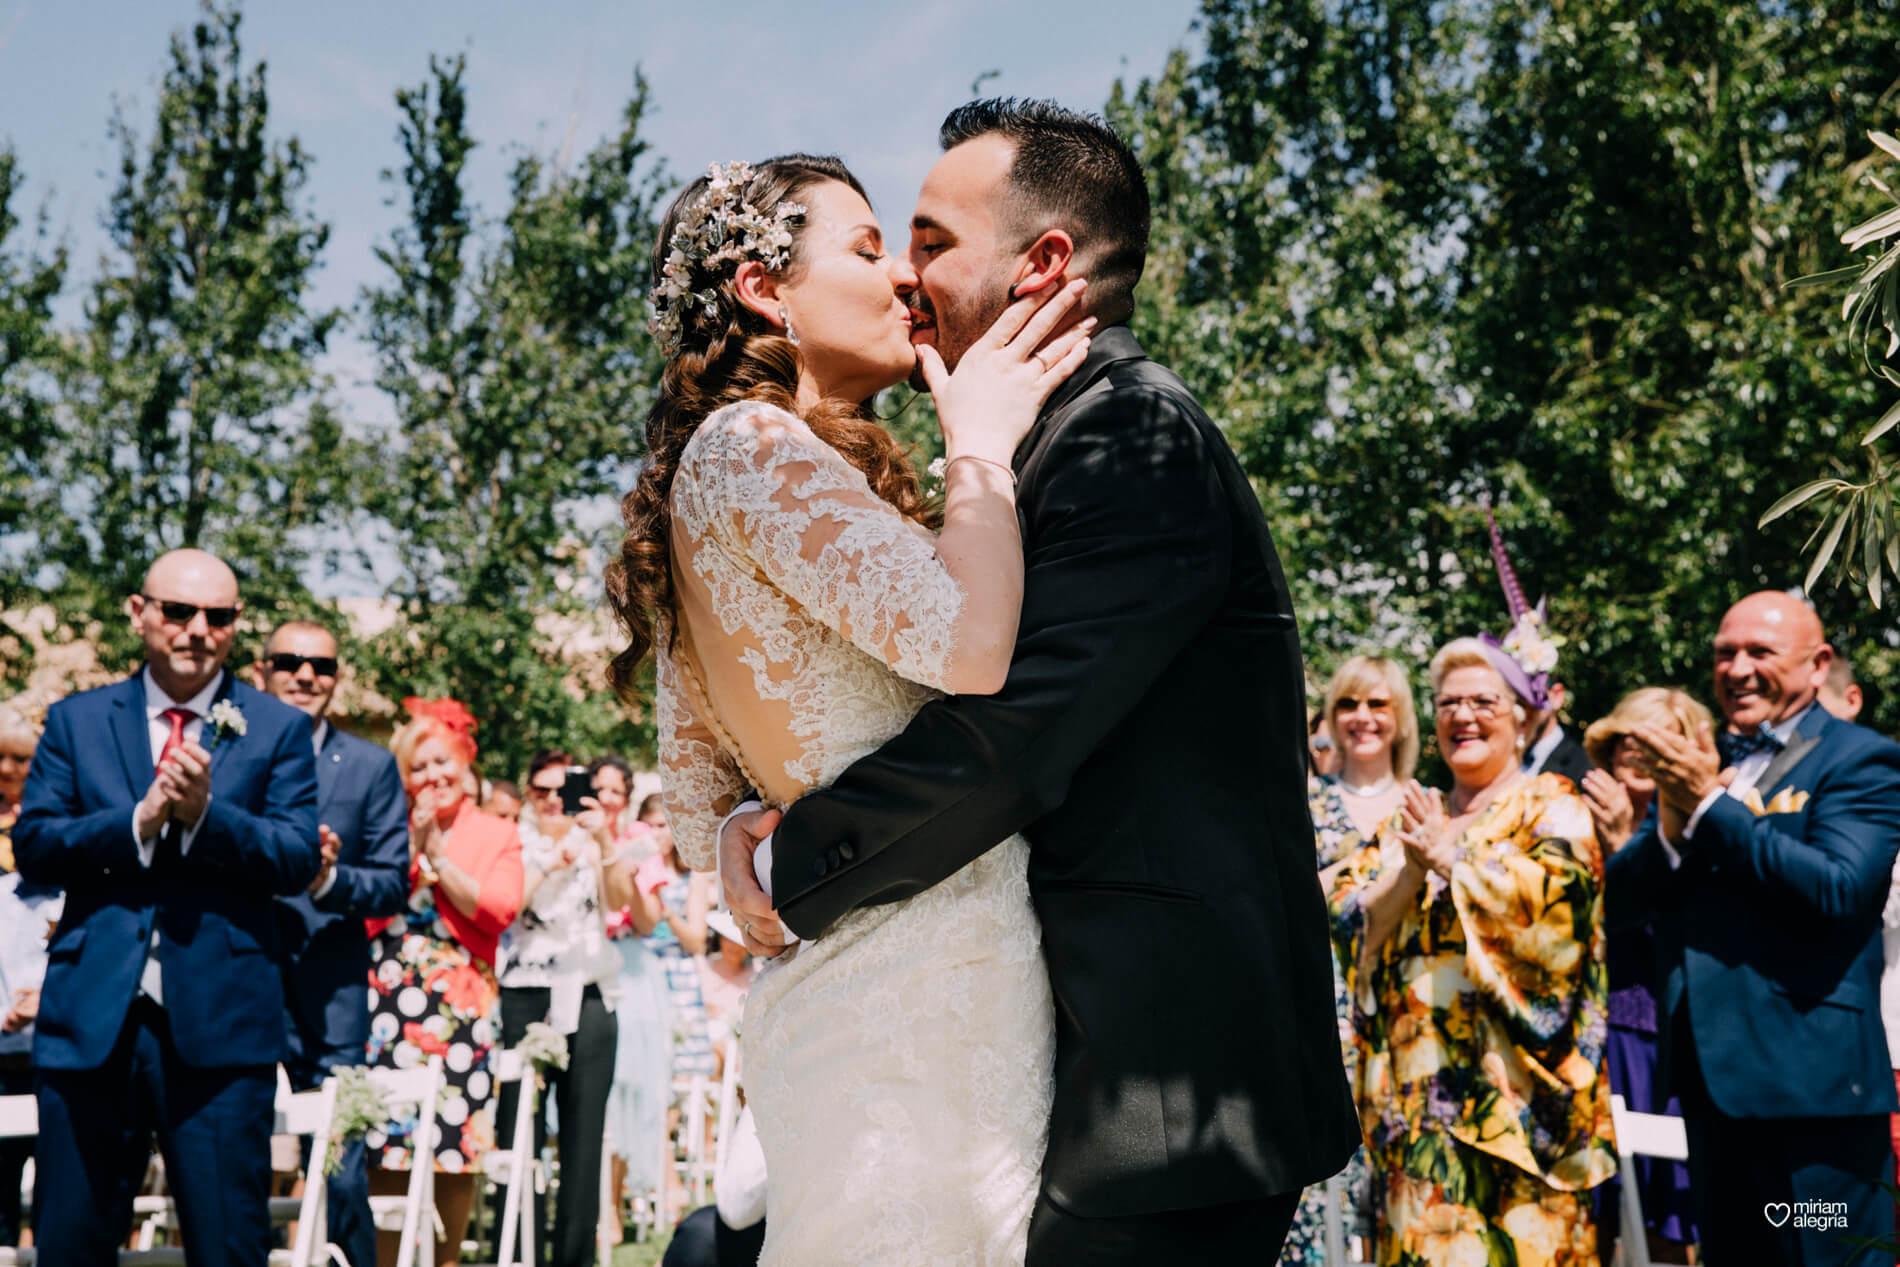 boda-en-finca-jurosa-miriam-alegria-73